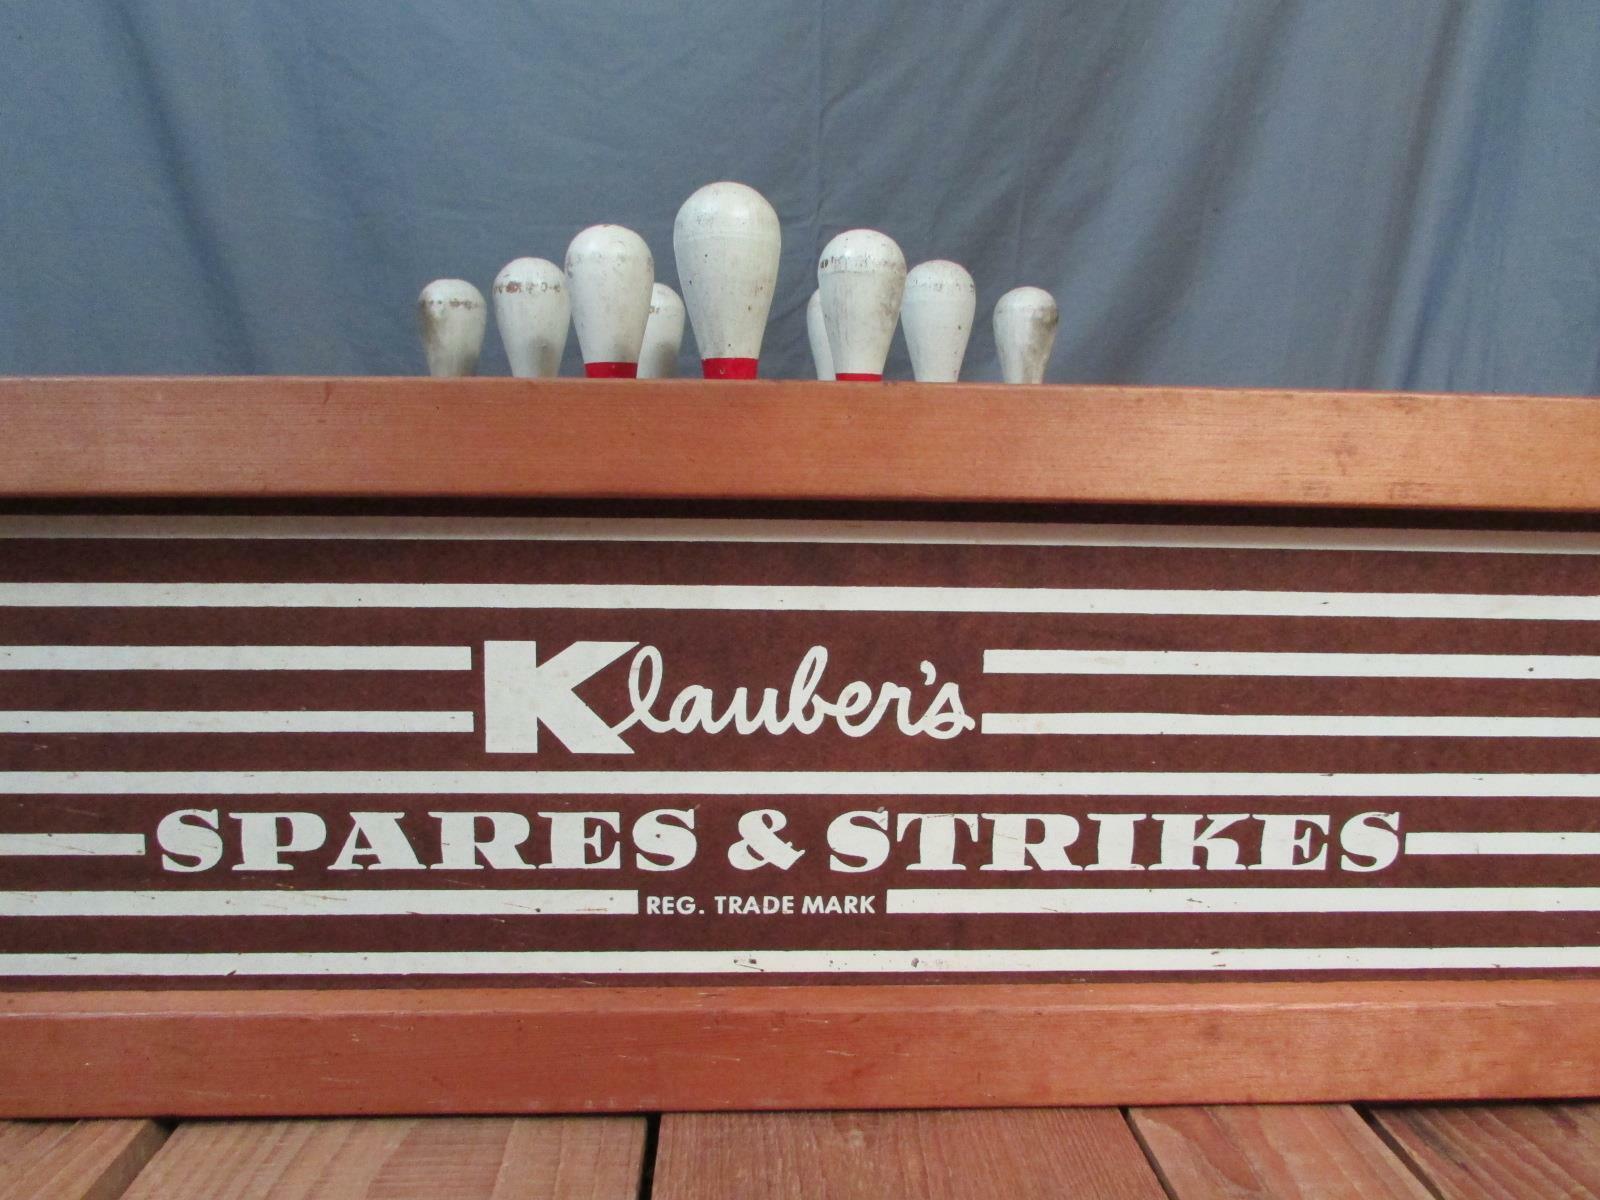 Vintage Antik Bowling Jagen Jagen Jagen Klaubers Ersatzteile & Strikes Holz Bälle 10 Selten cccda9